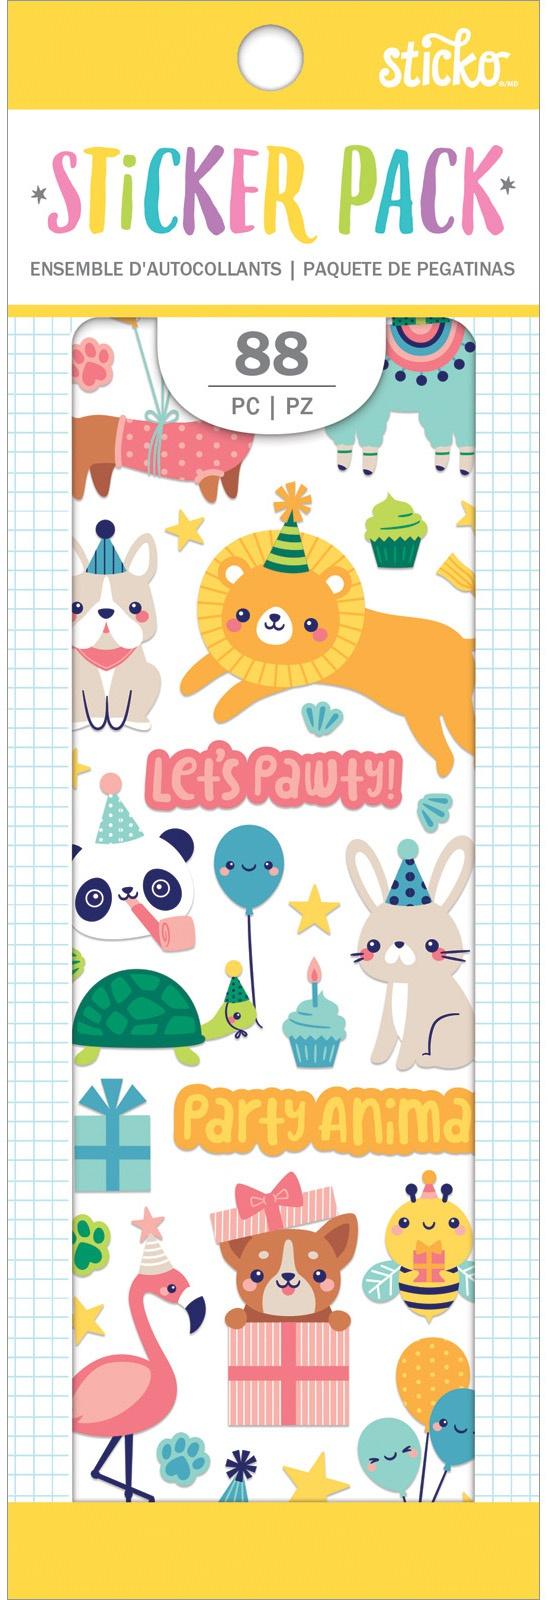 Sticko Sticker Pack-Party Animal, 88/Pkg